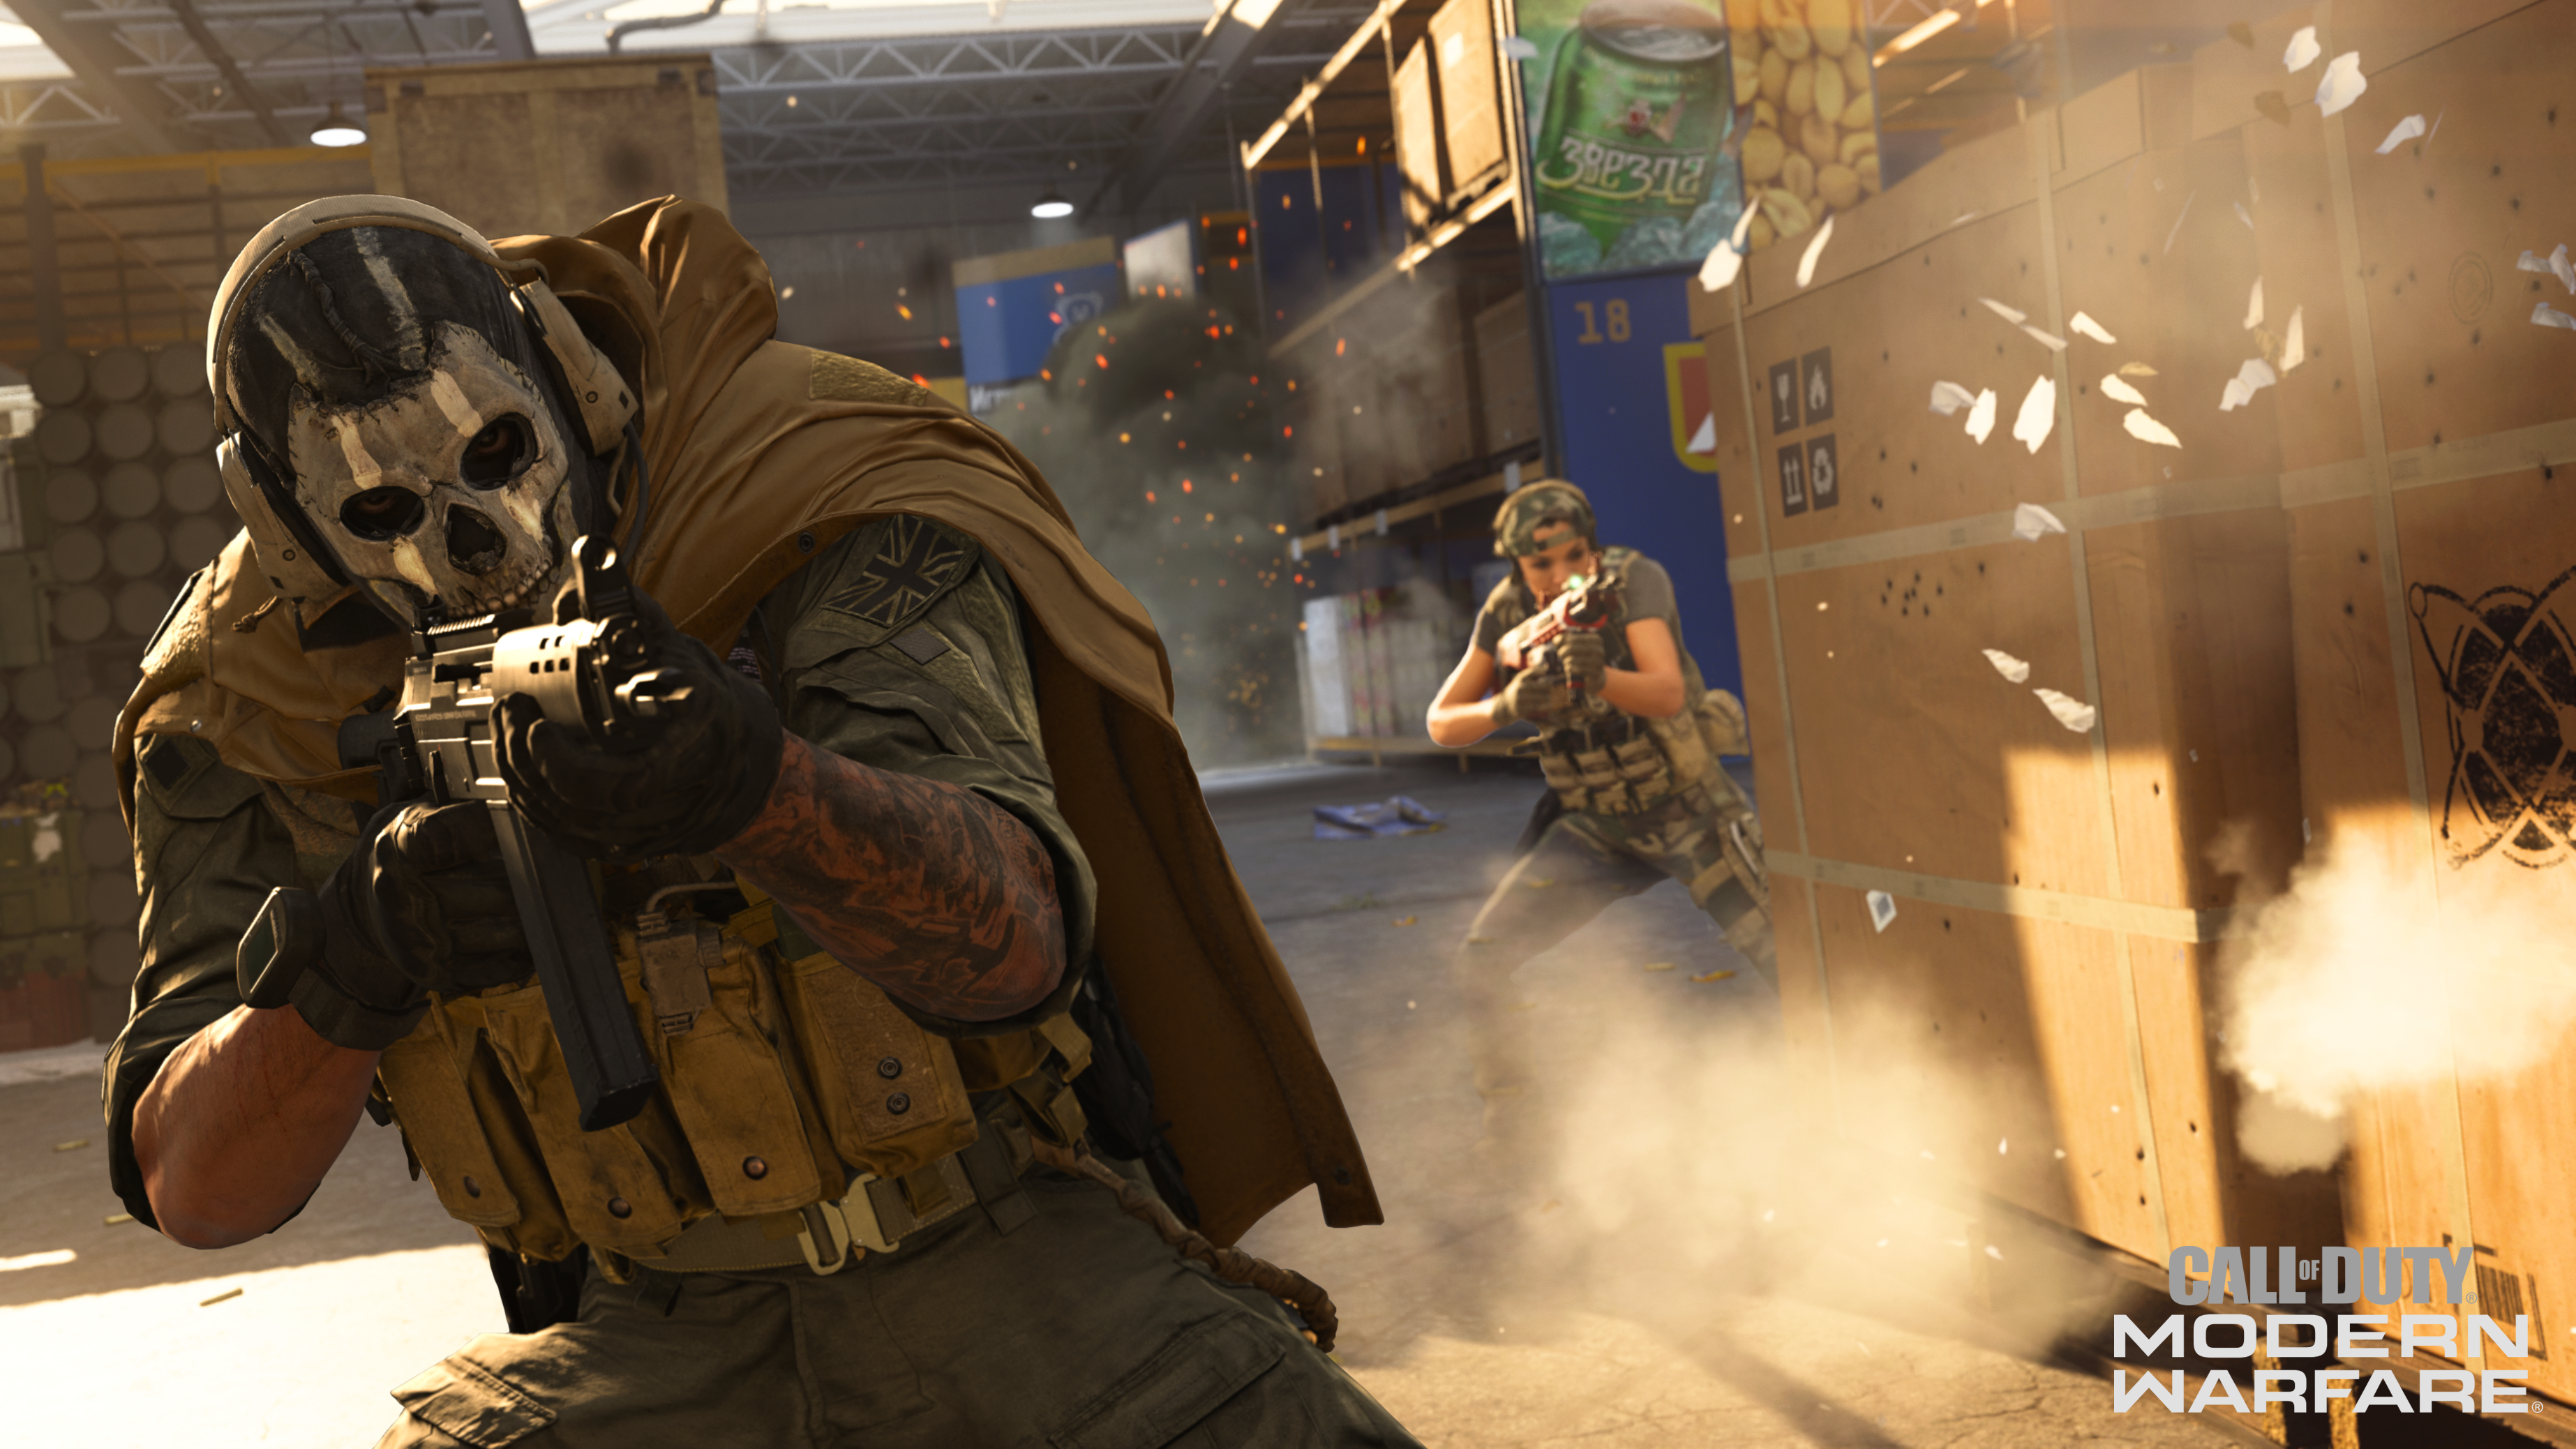 Simon Ghost Riley 2019 Call Of Duty Wiki Fandom In 2020 Modern Warfare Call Of Duty Call Of Duty Ghosts